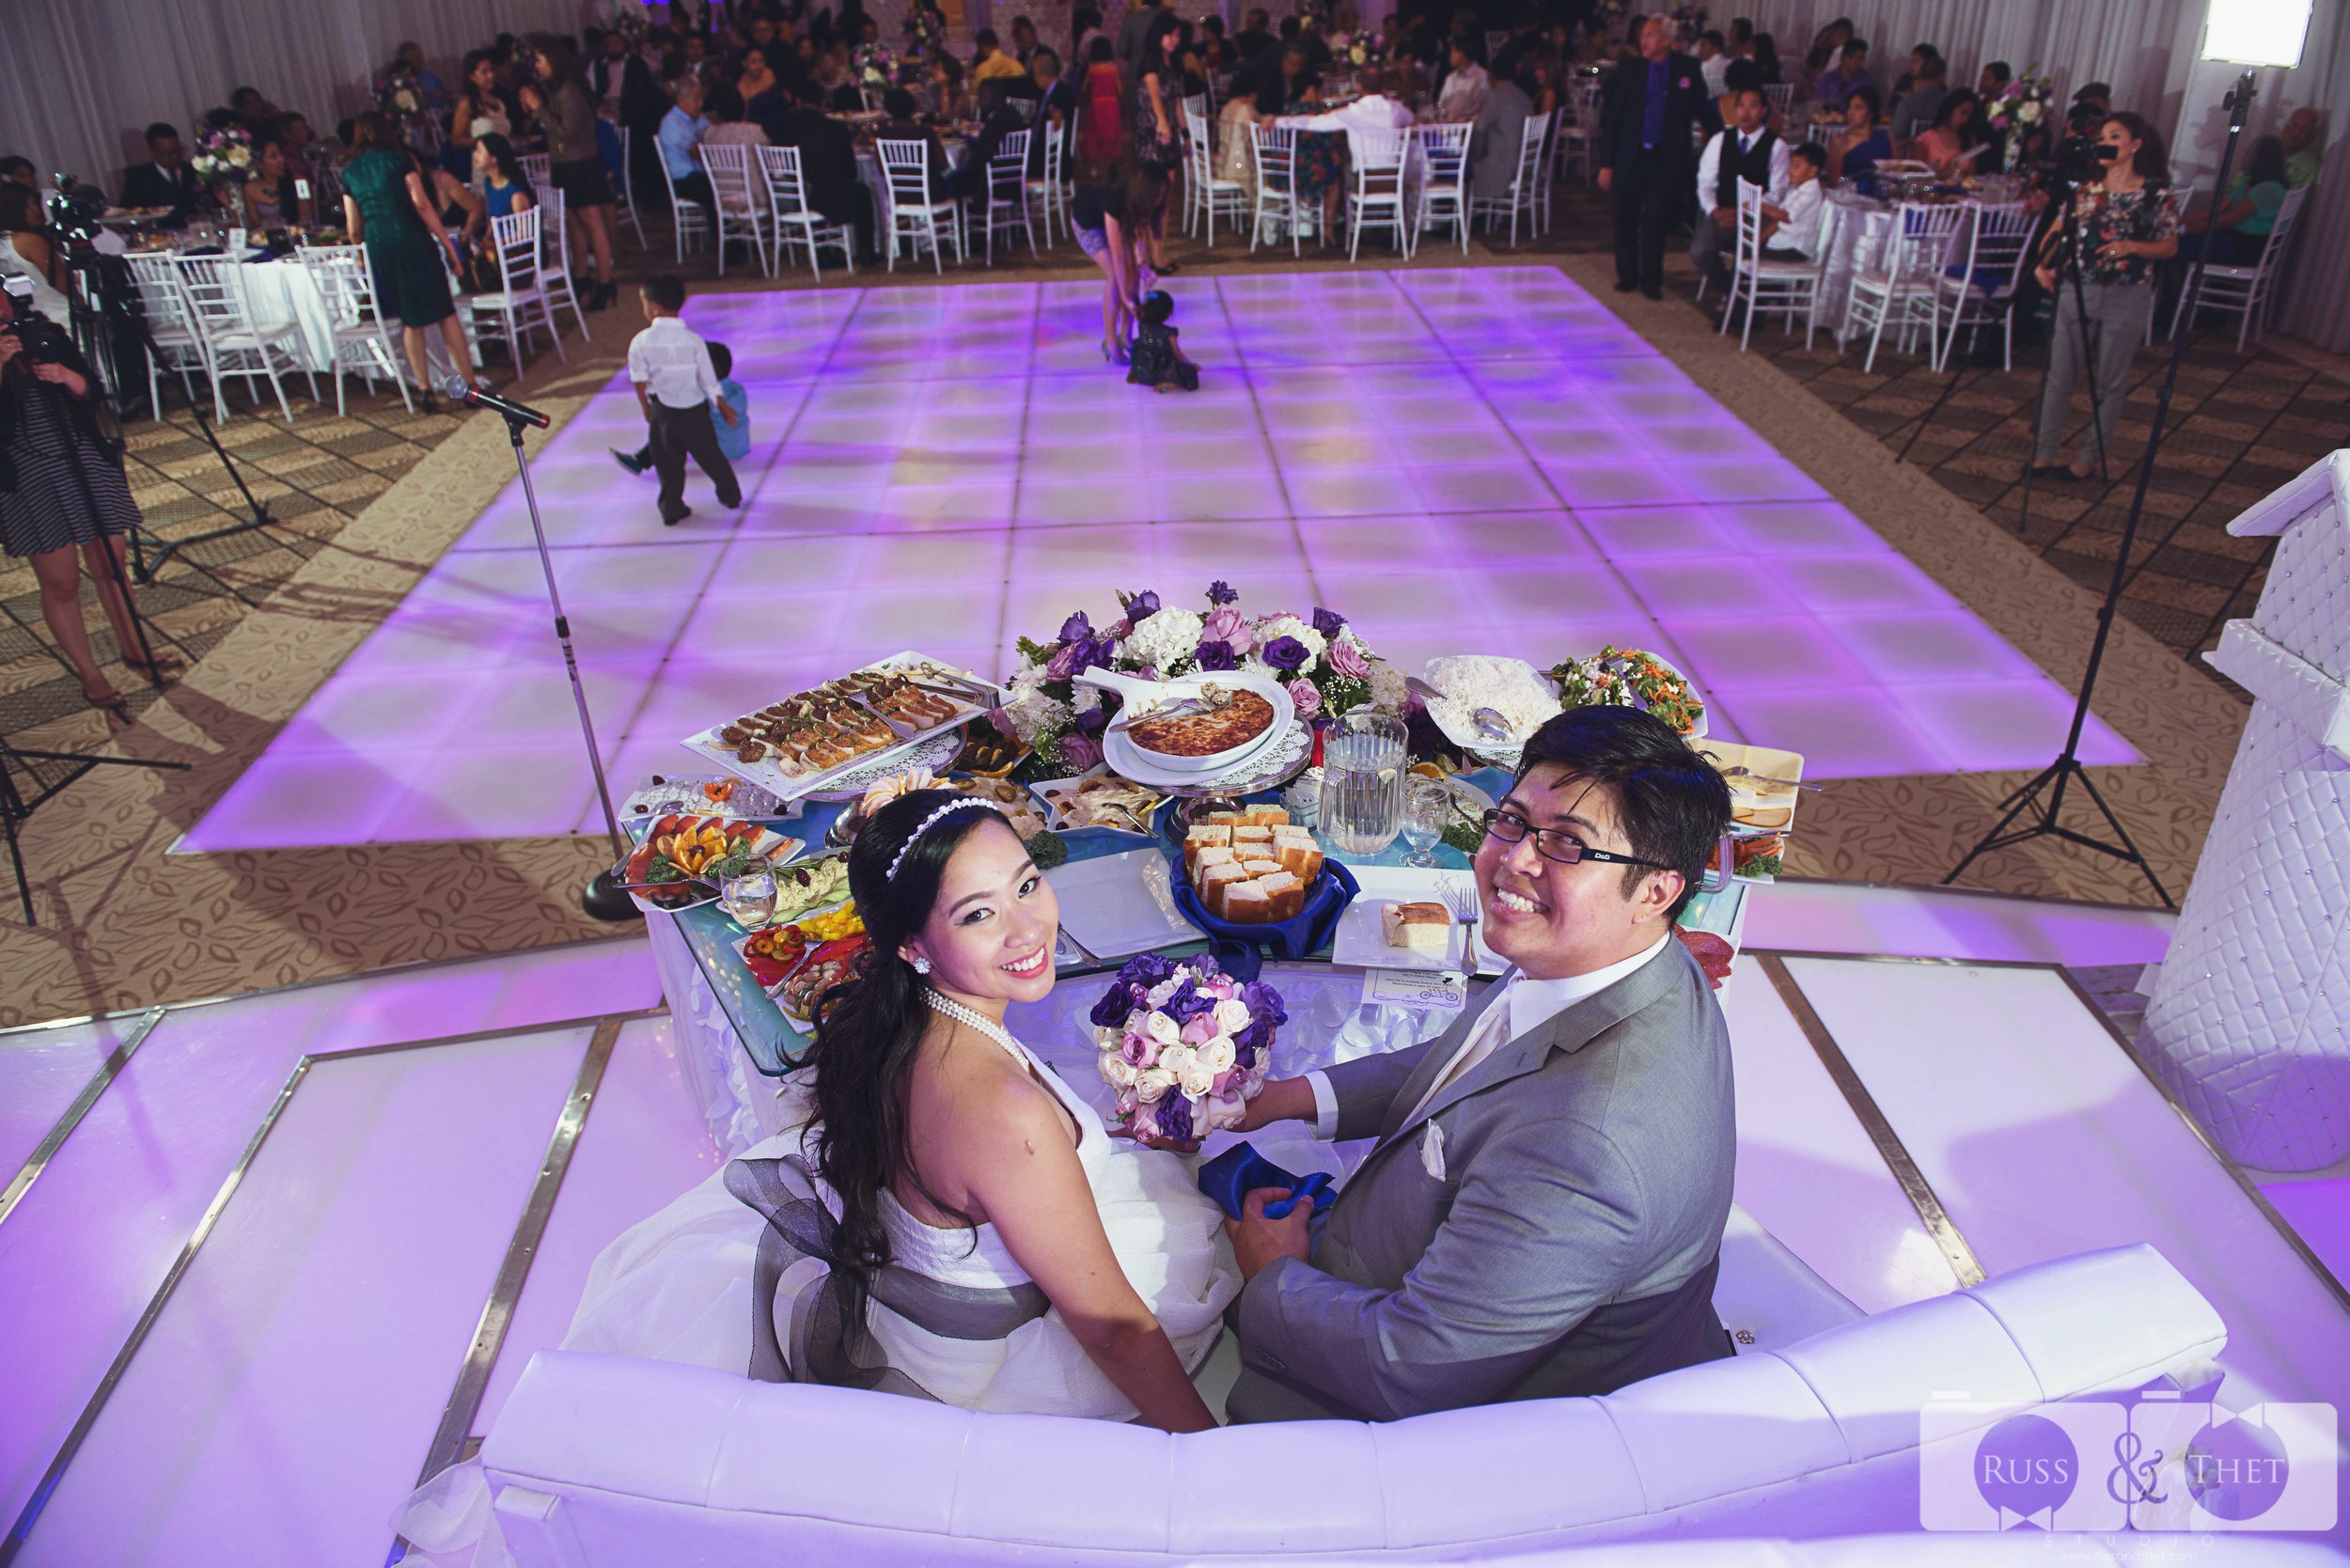 royal-palace-banquet-hall-glendale-wedding-59.JPG